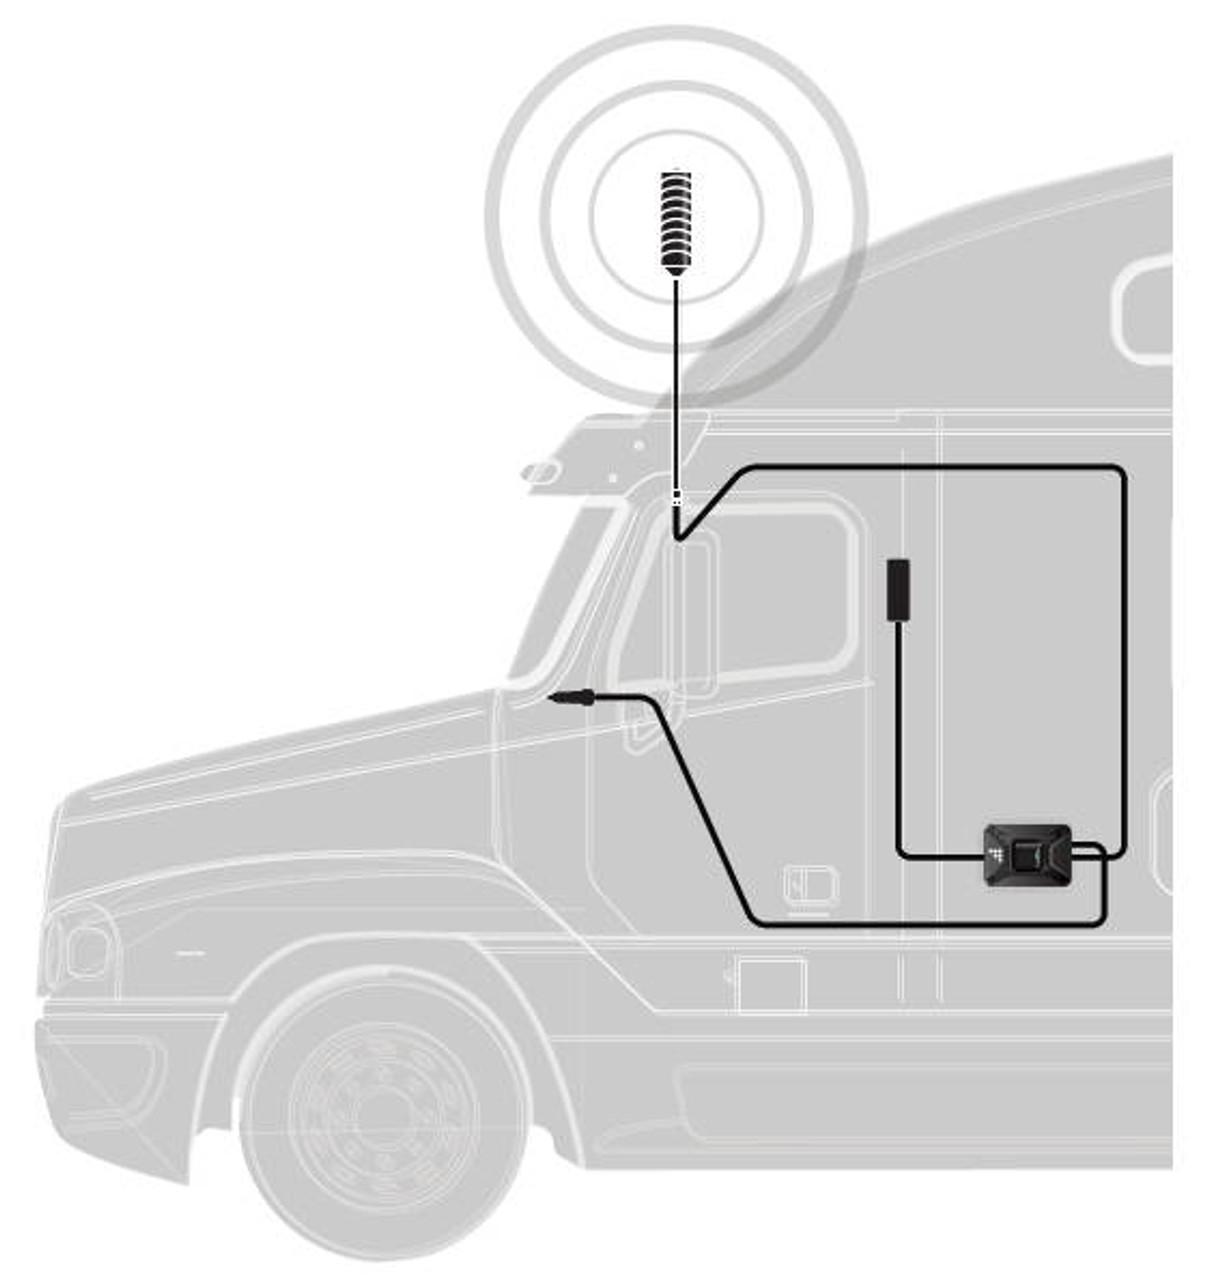 weboost drive 4g x otr truck signal booster system diagram  [ 1215 x 1280 Pixel ]